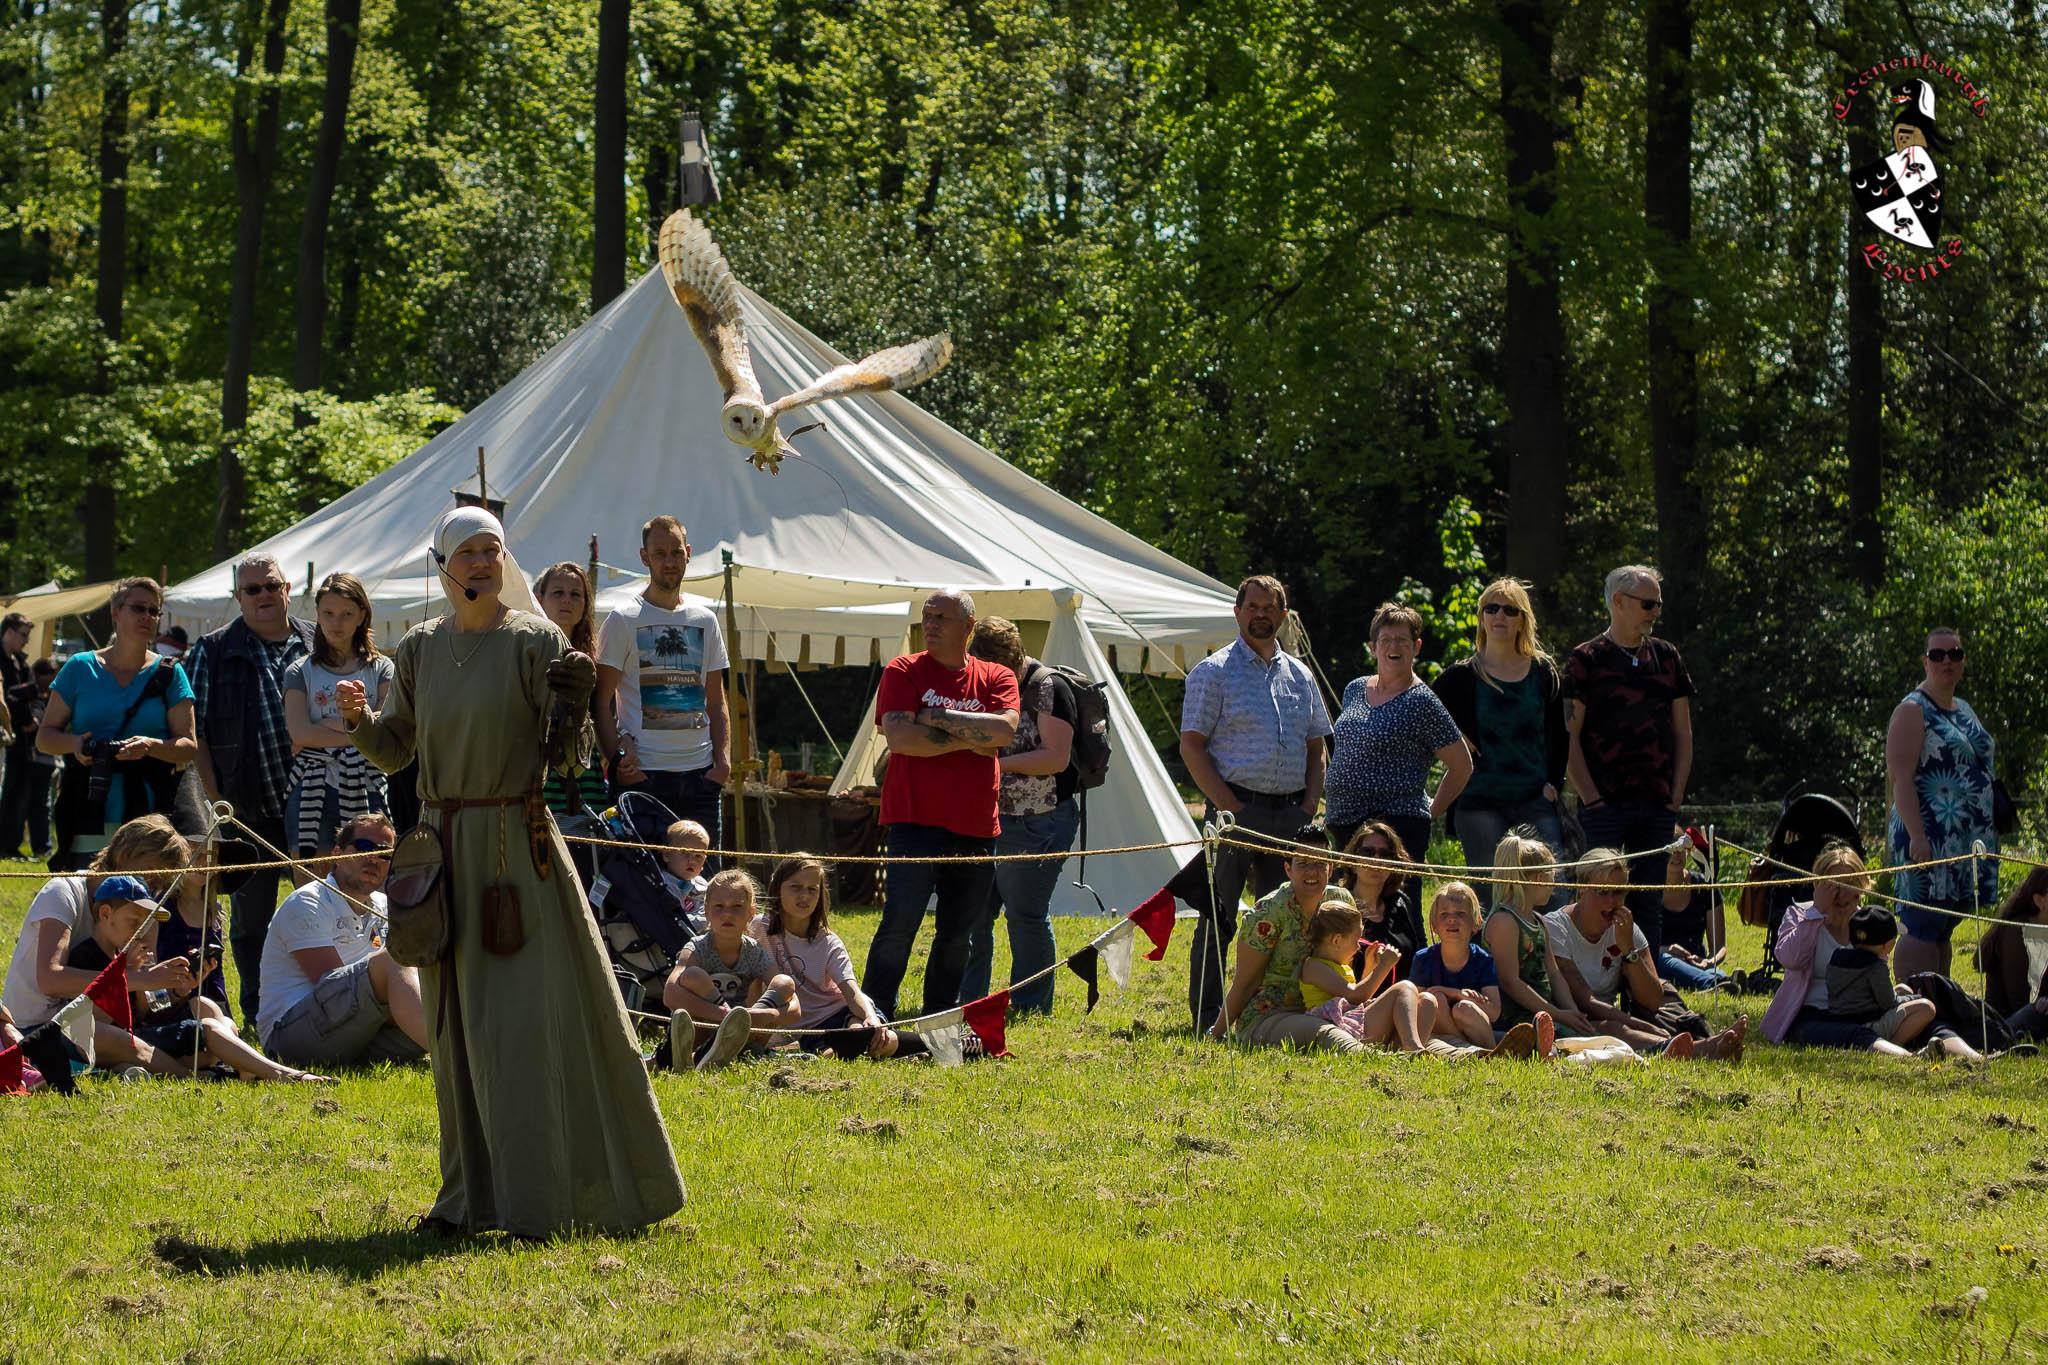 Middeleeuws-Festijn-Cannenburgh-2018-Algemeen-Ellen-la-Faille-4